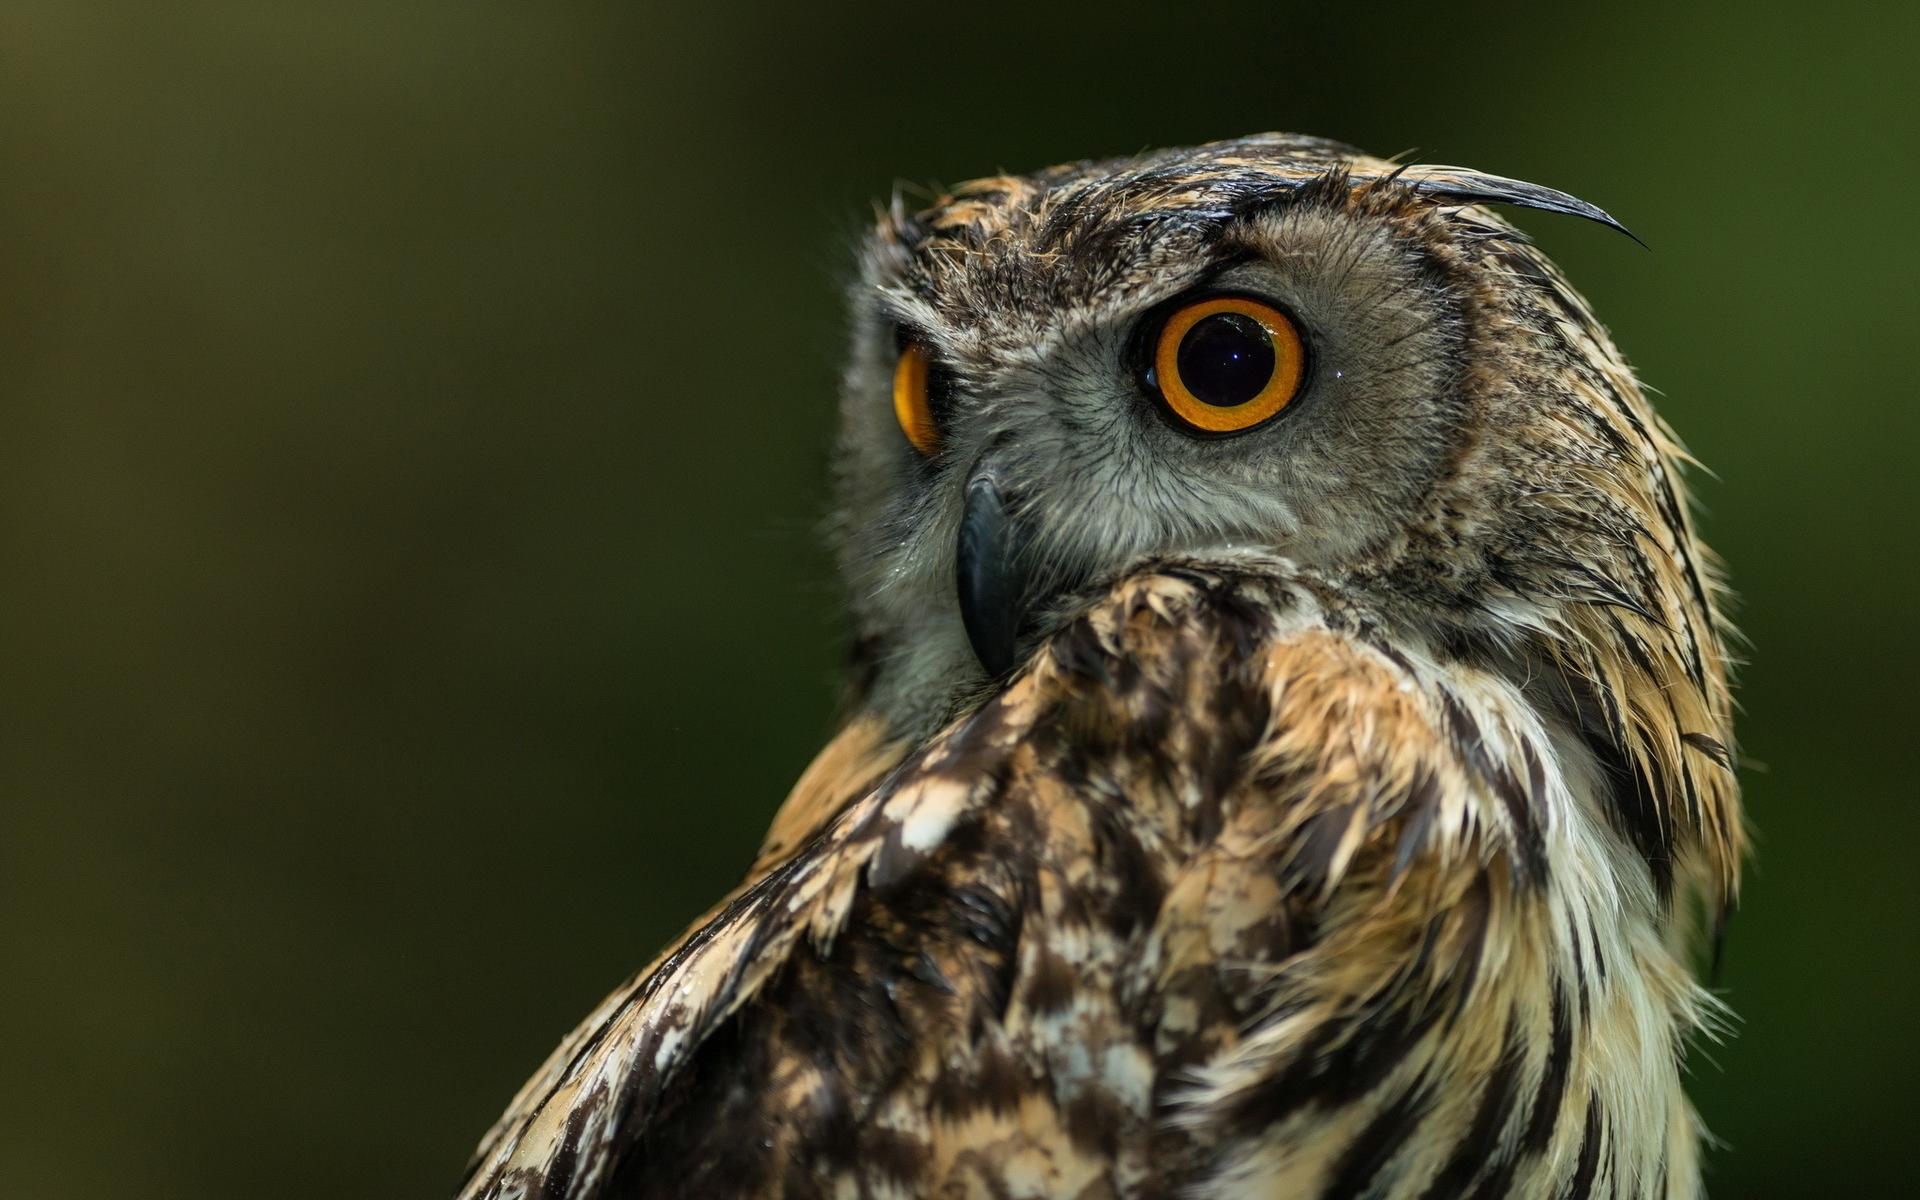 Owl Hd Wallpaper 1920x1200 13905